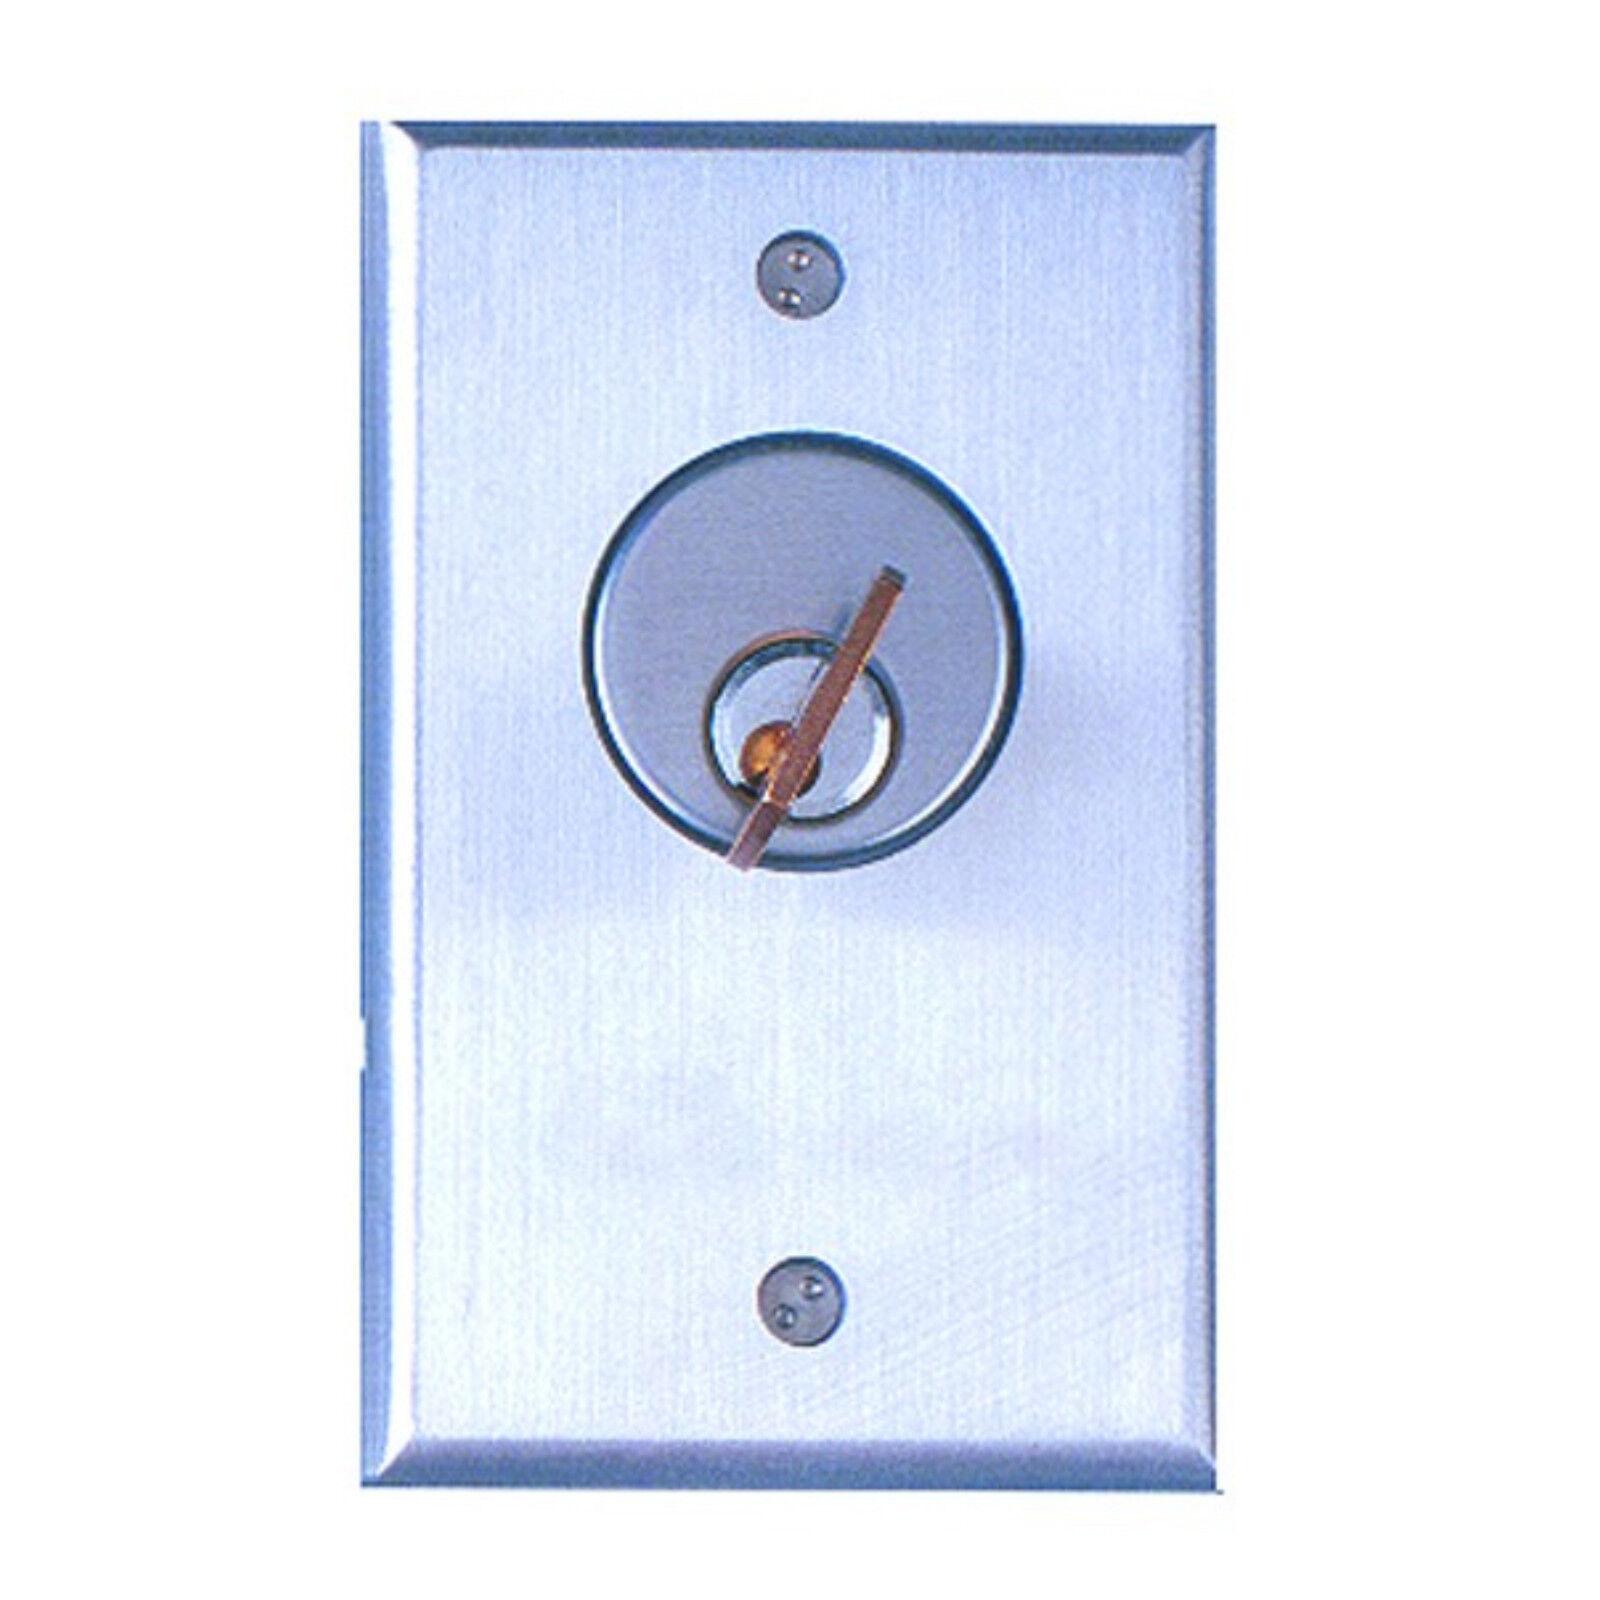 CAMDEN DOOR CONTROLS U.S CM-1110 KEY SWITCH SPST MOM  SNG GNG SPST